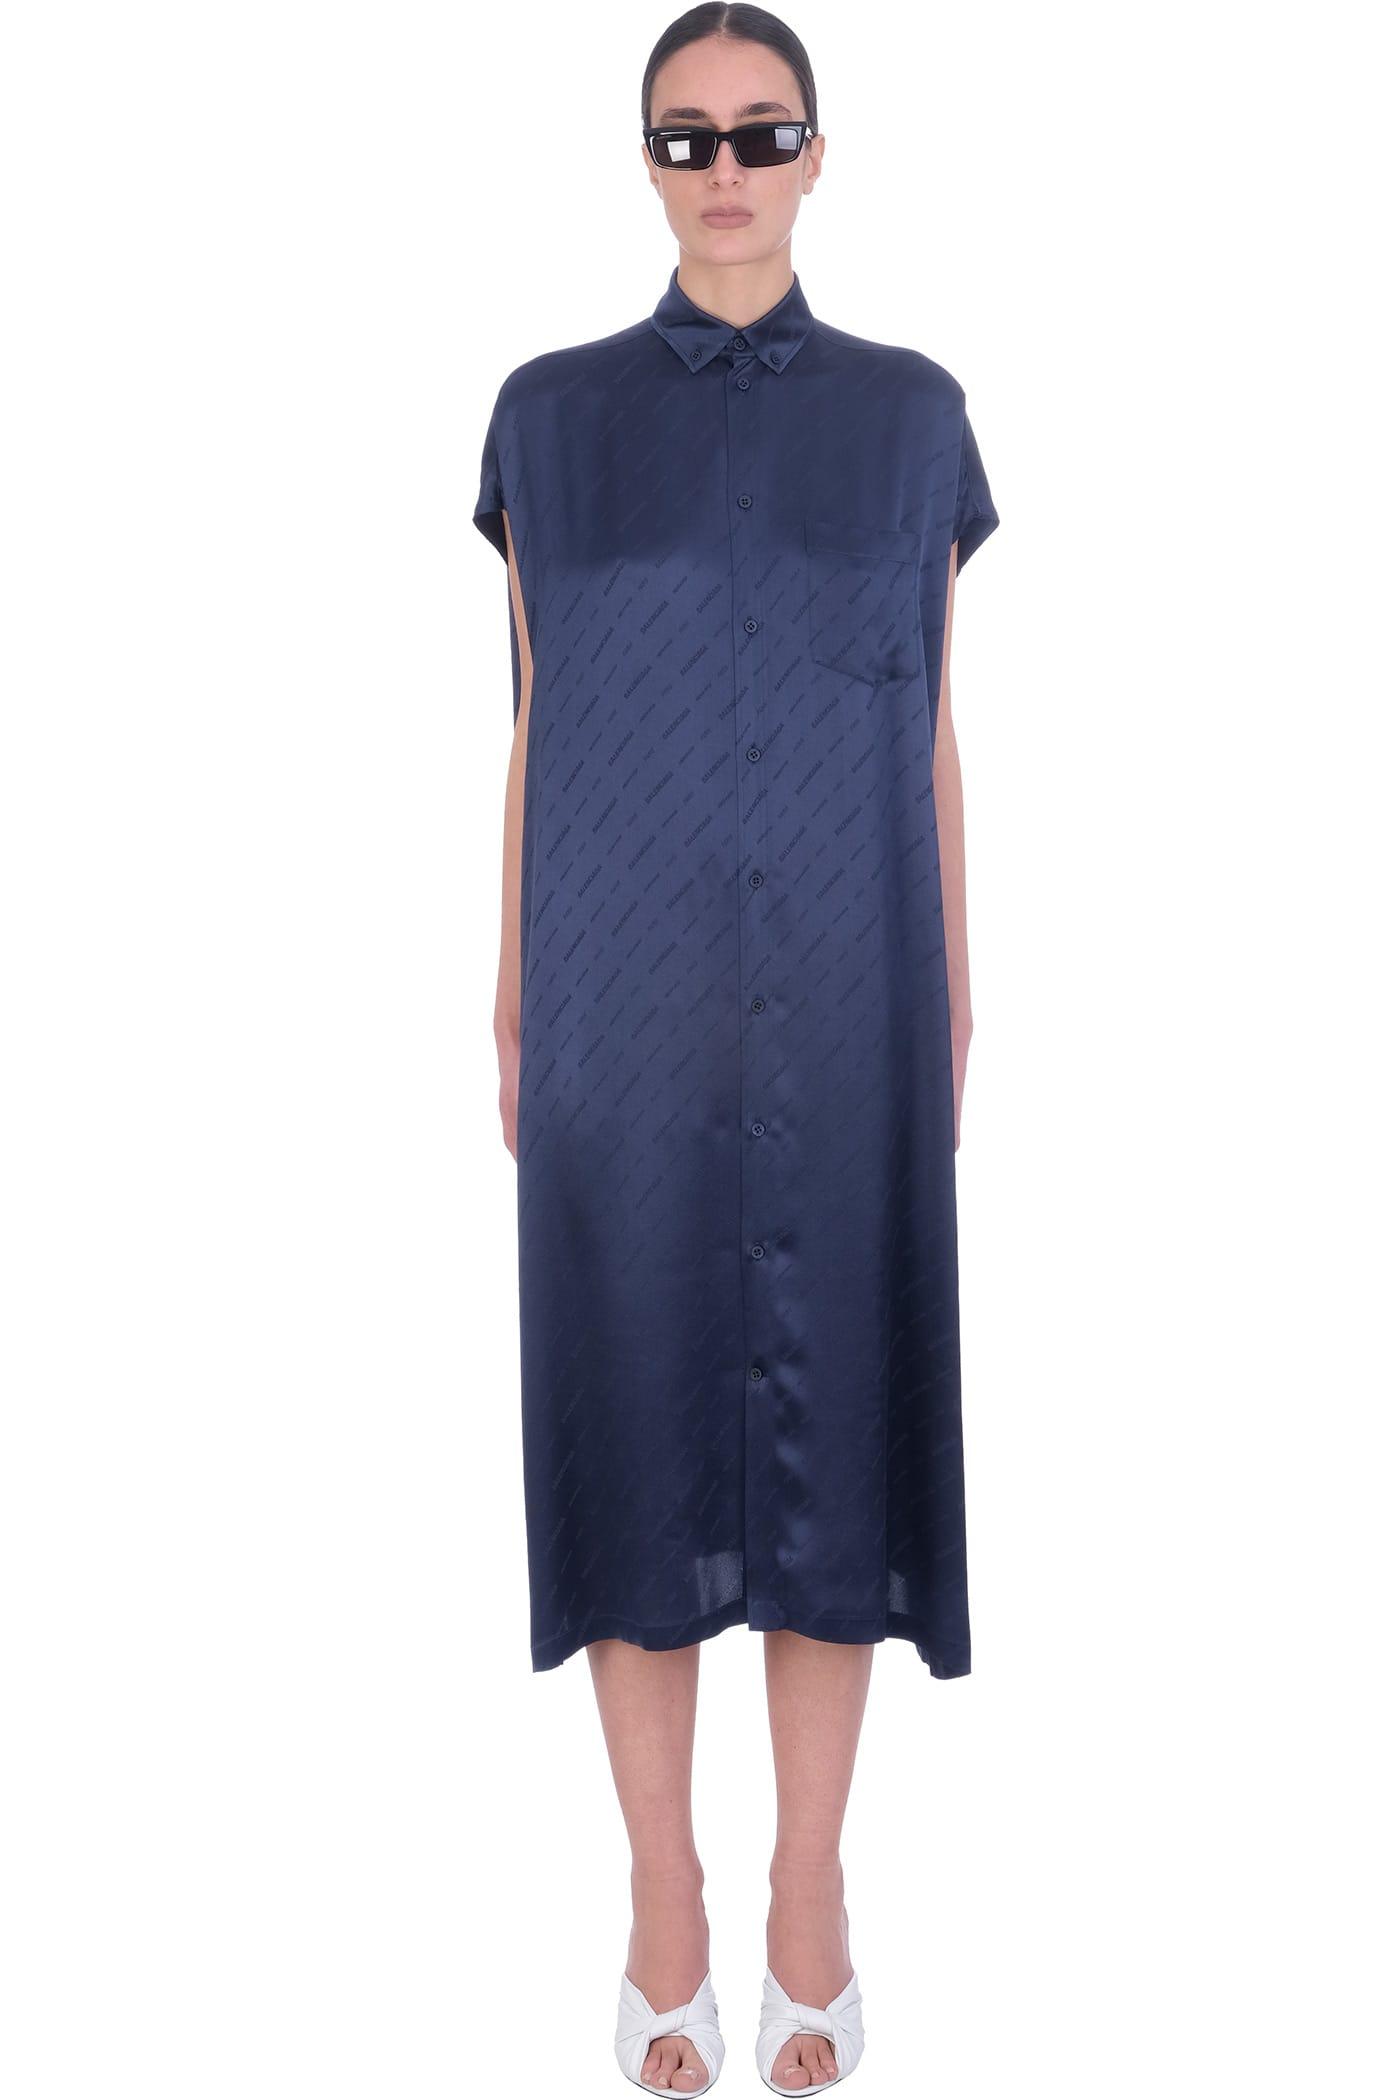 Balenciaga DRESS IN BLUE SILK